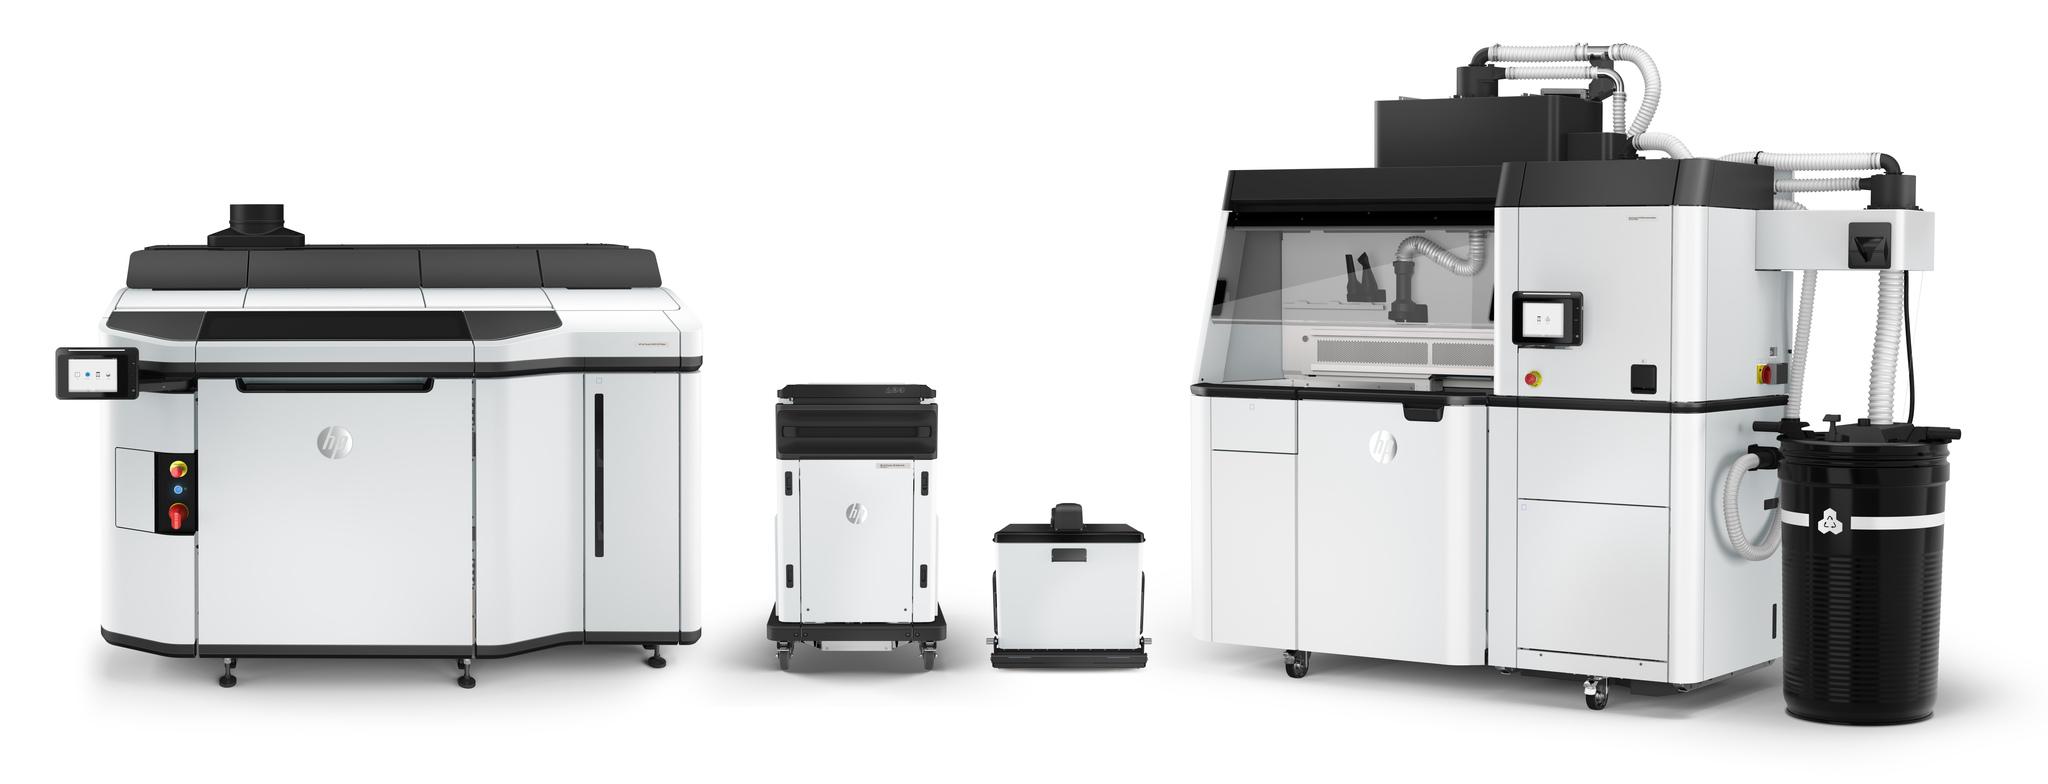 digitale Fertigung mit HP Jet Fusion 5200